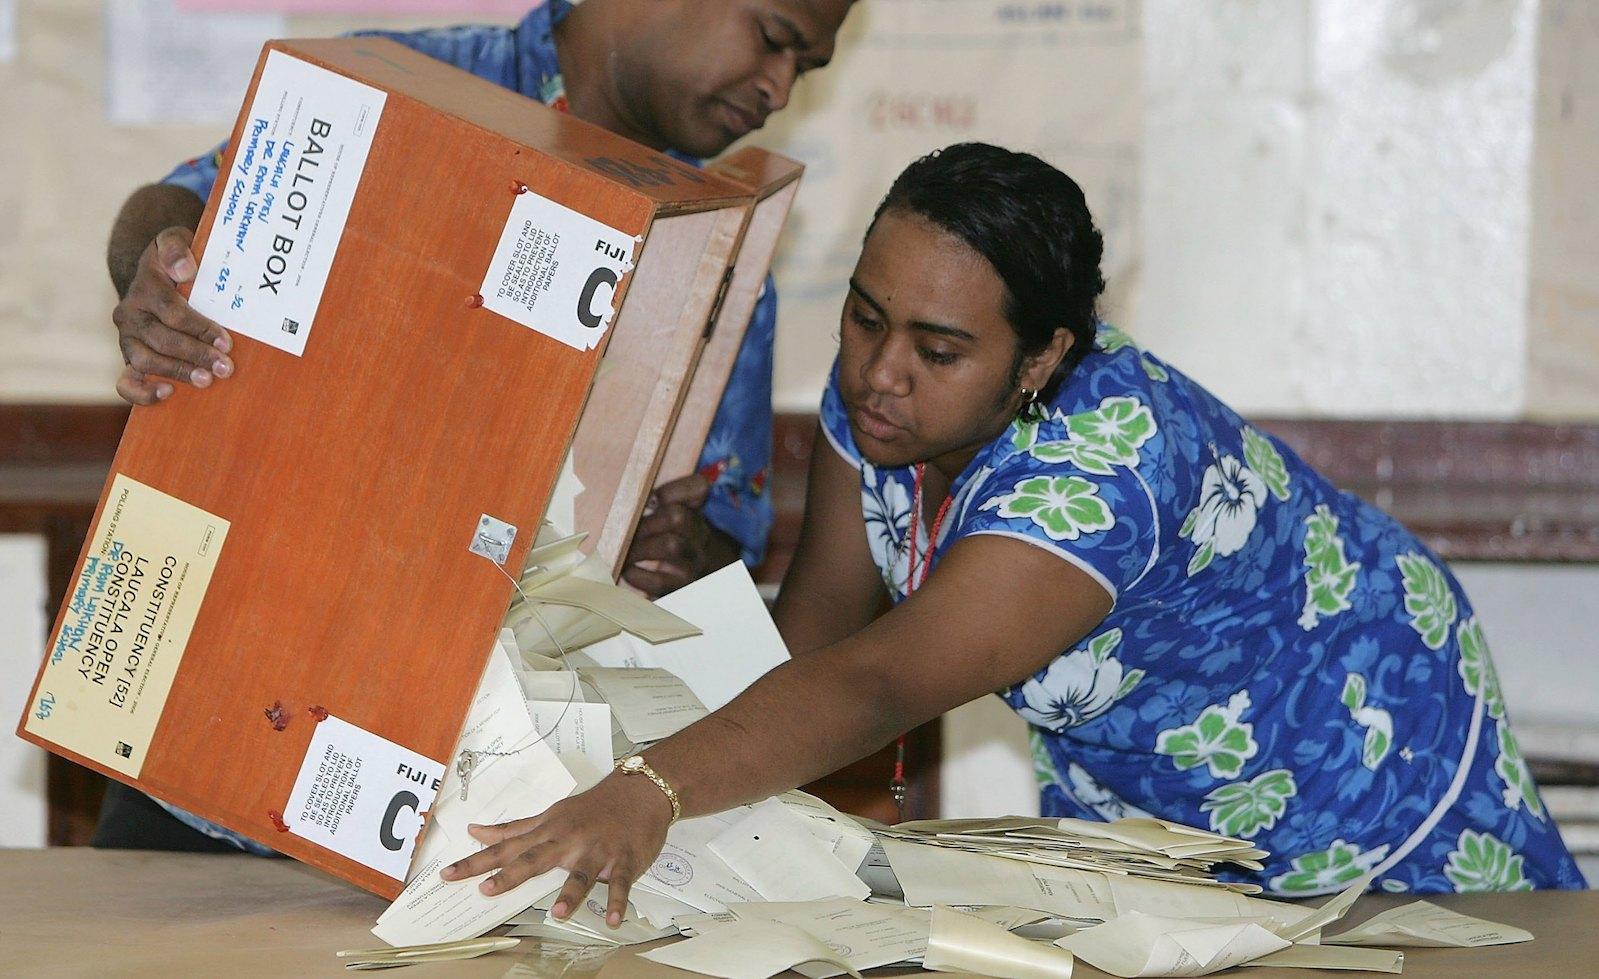 Workers empty a ballot box in Suva, Fiji in 2006 (Photo: Sandra Mu via Getty)